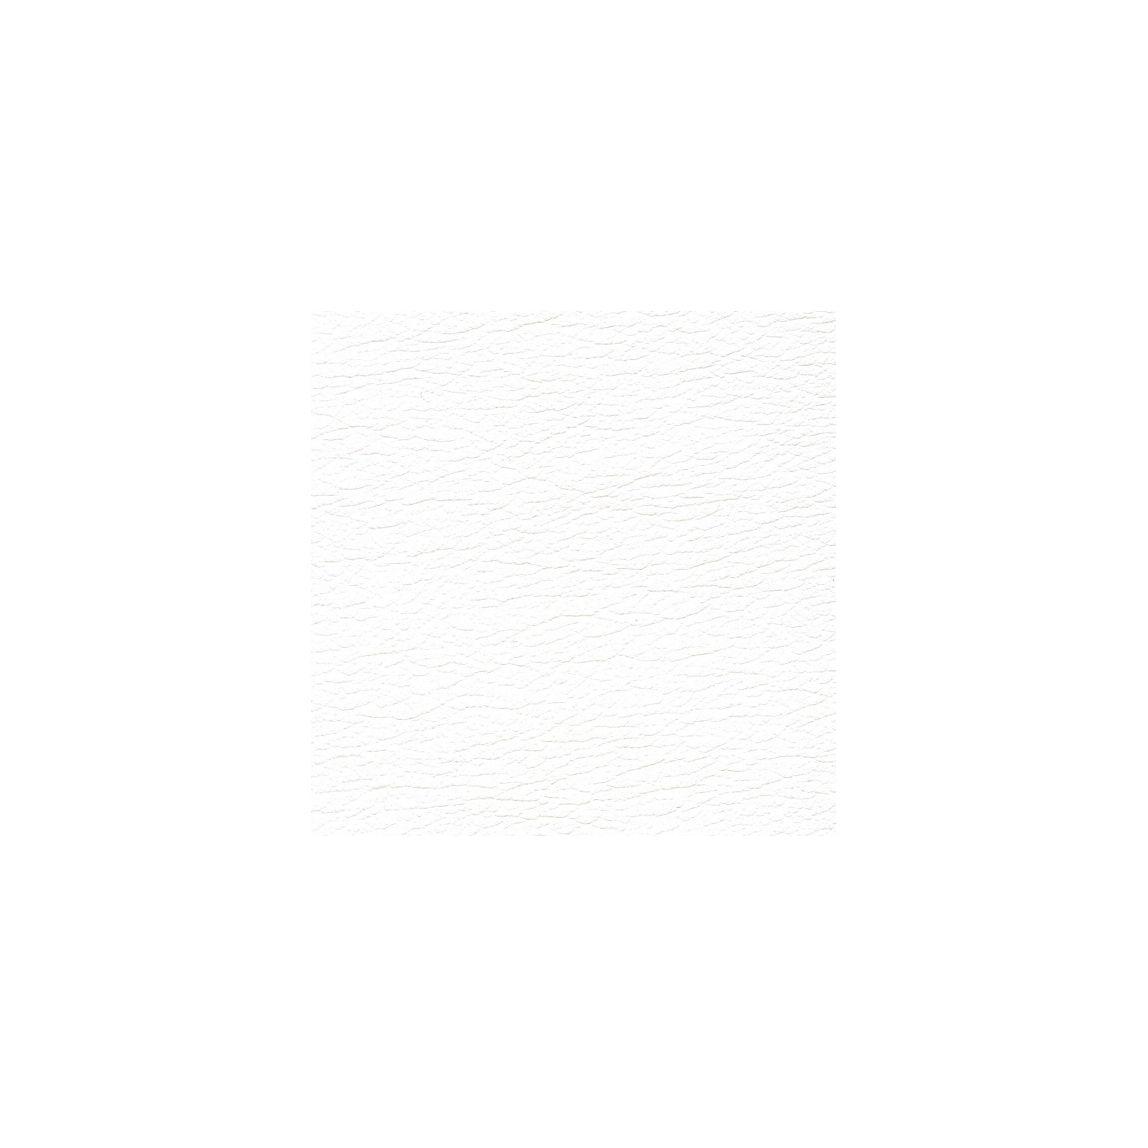 Ultraleather Pro White Wash Swatch